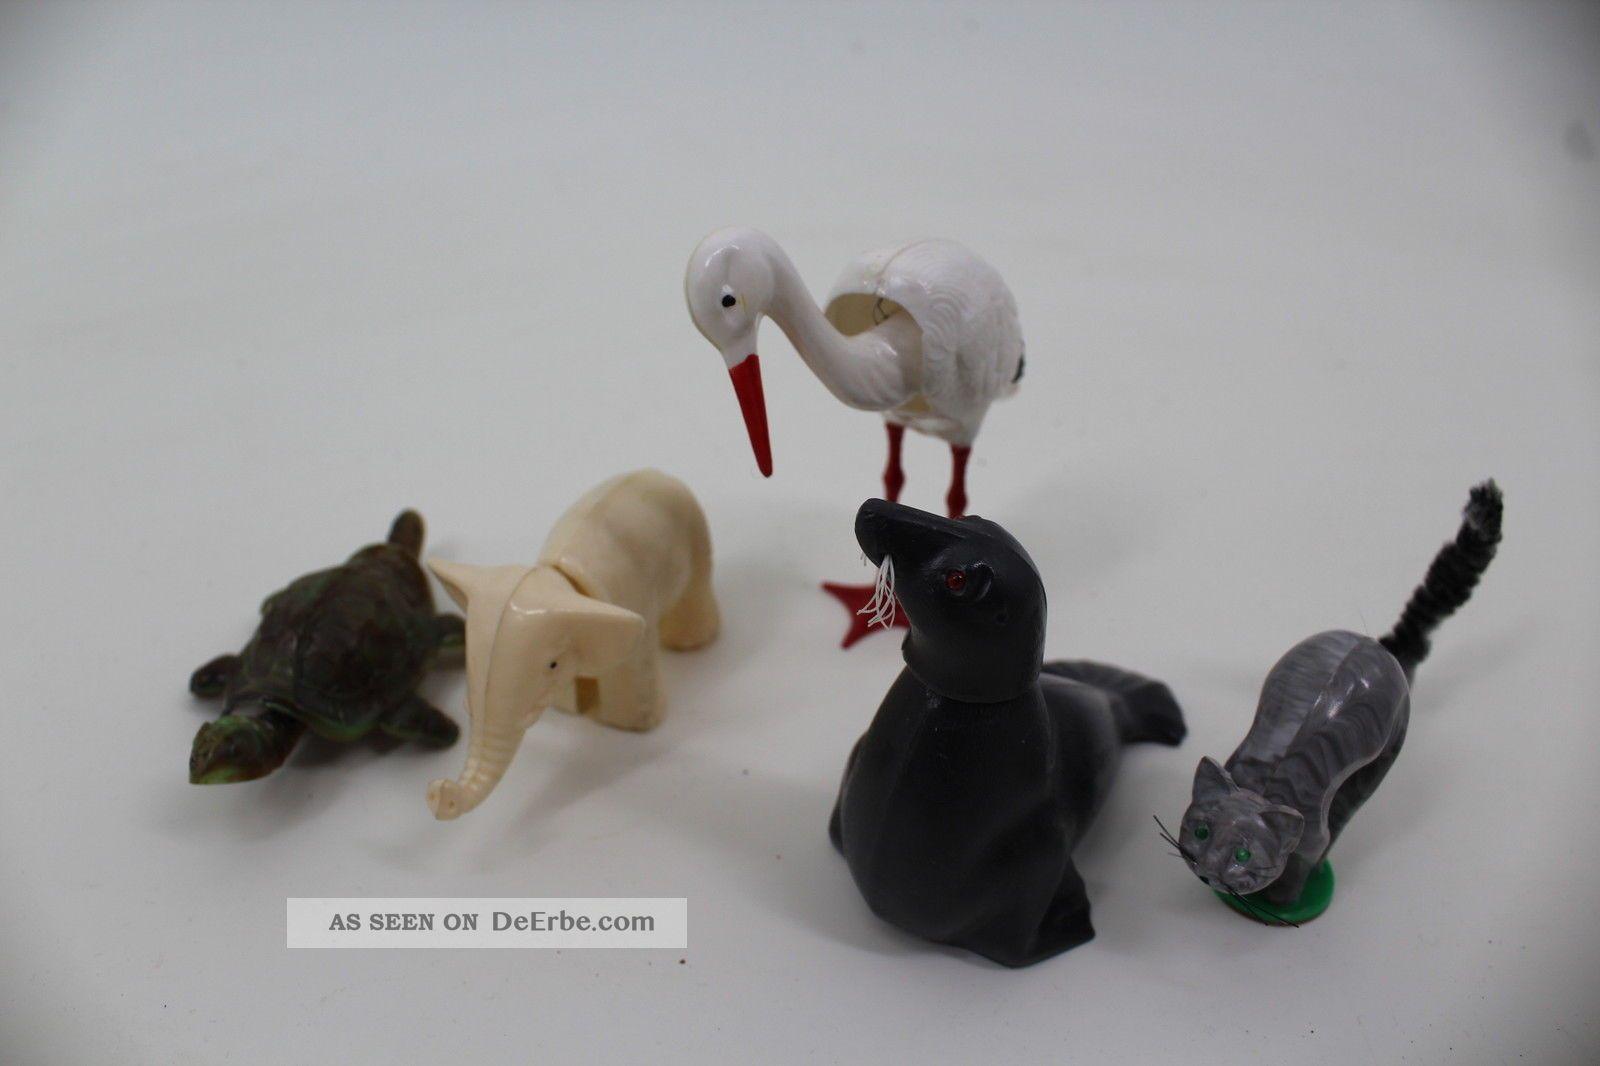 5 Wackelkopf Tiere Aus Kunststoff Breba 1960 Antikspielzeug Bild